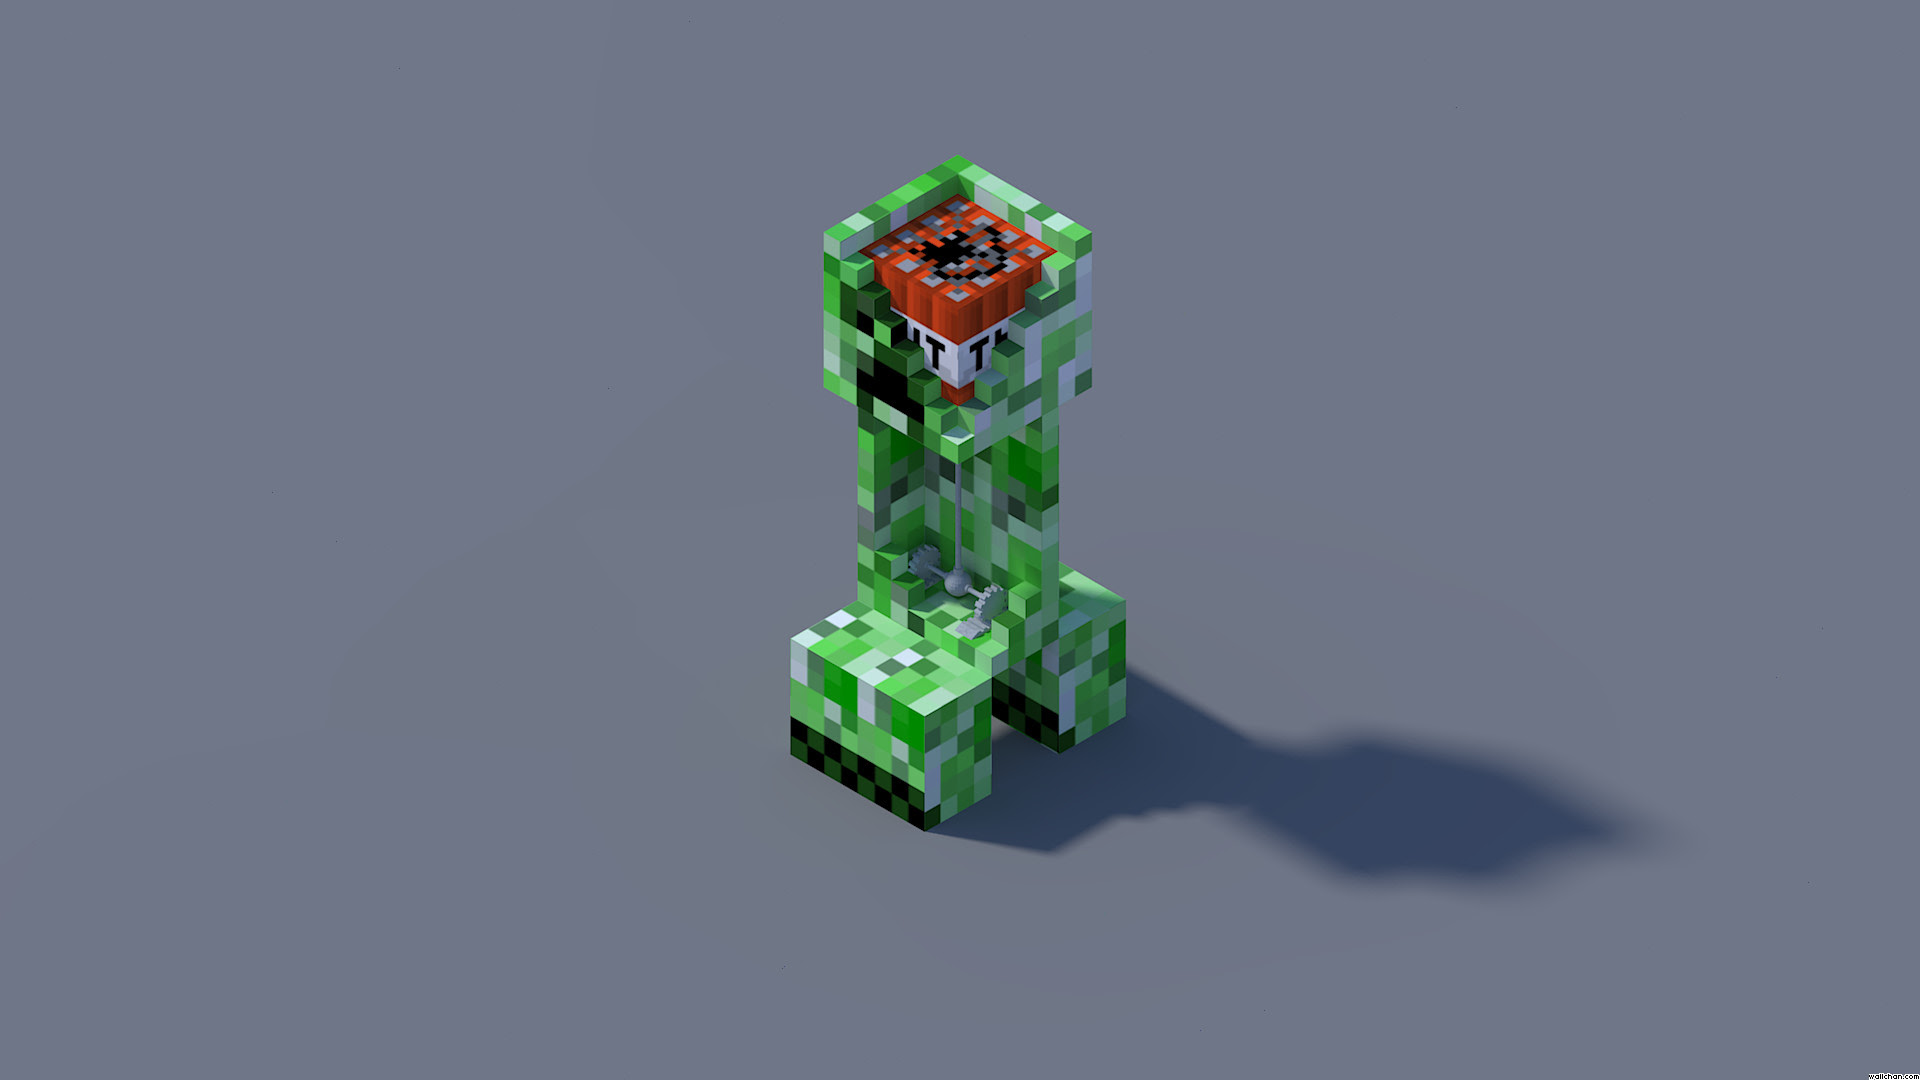 Minecraft Creeper Wallpaper (76+ images)